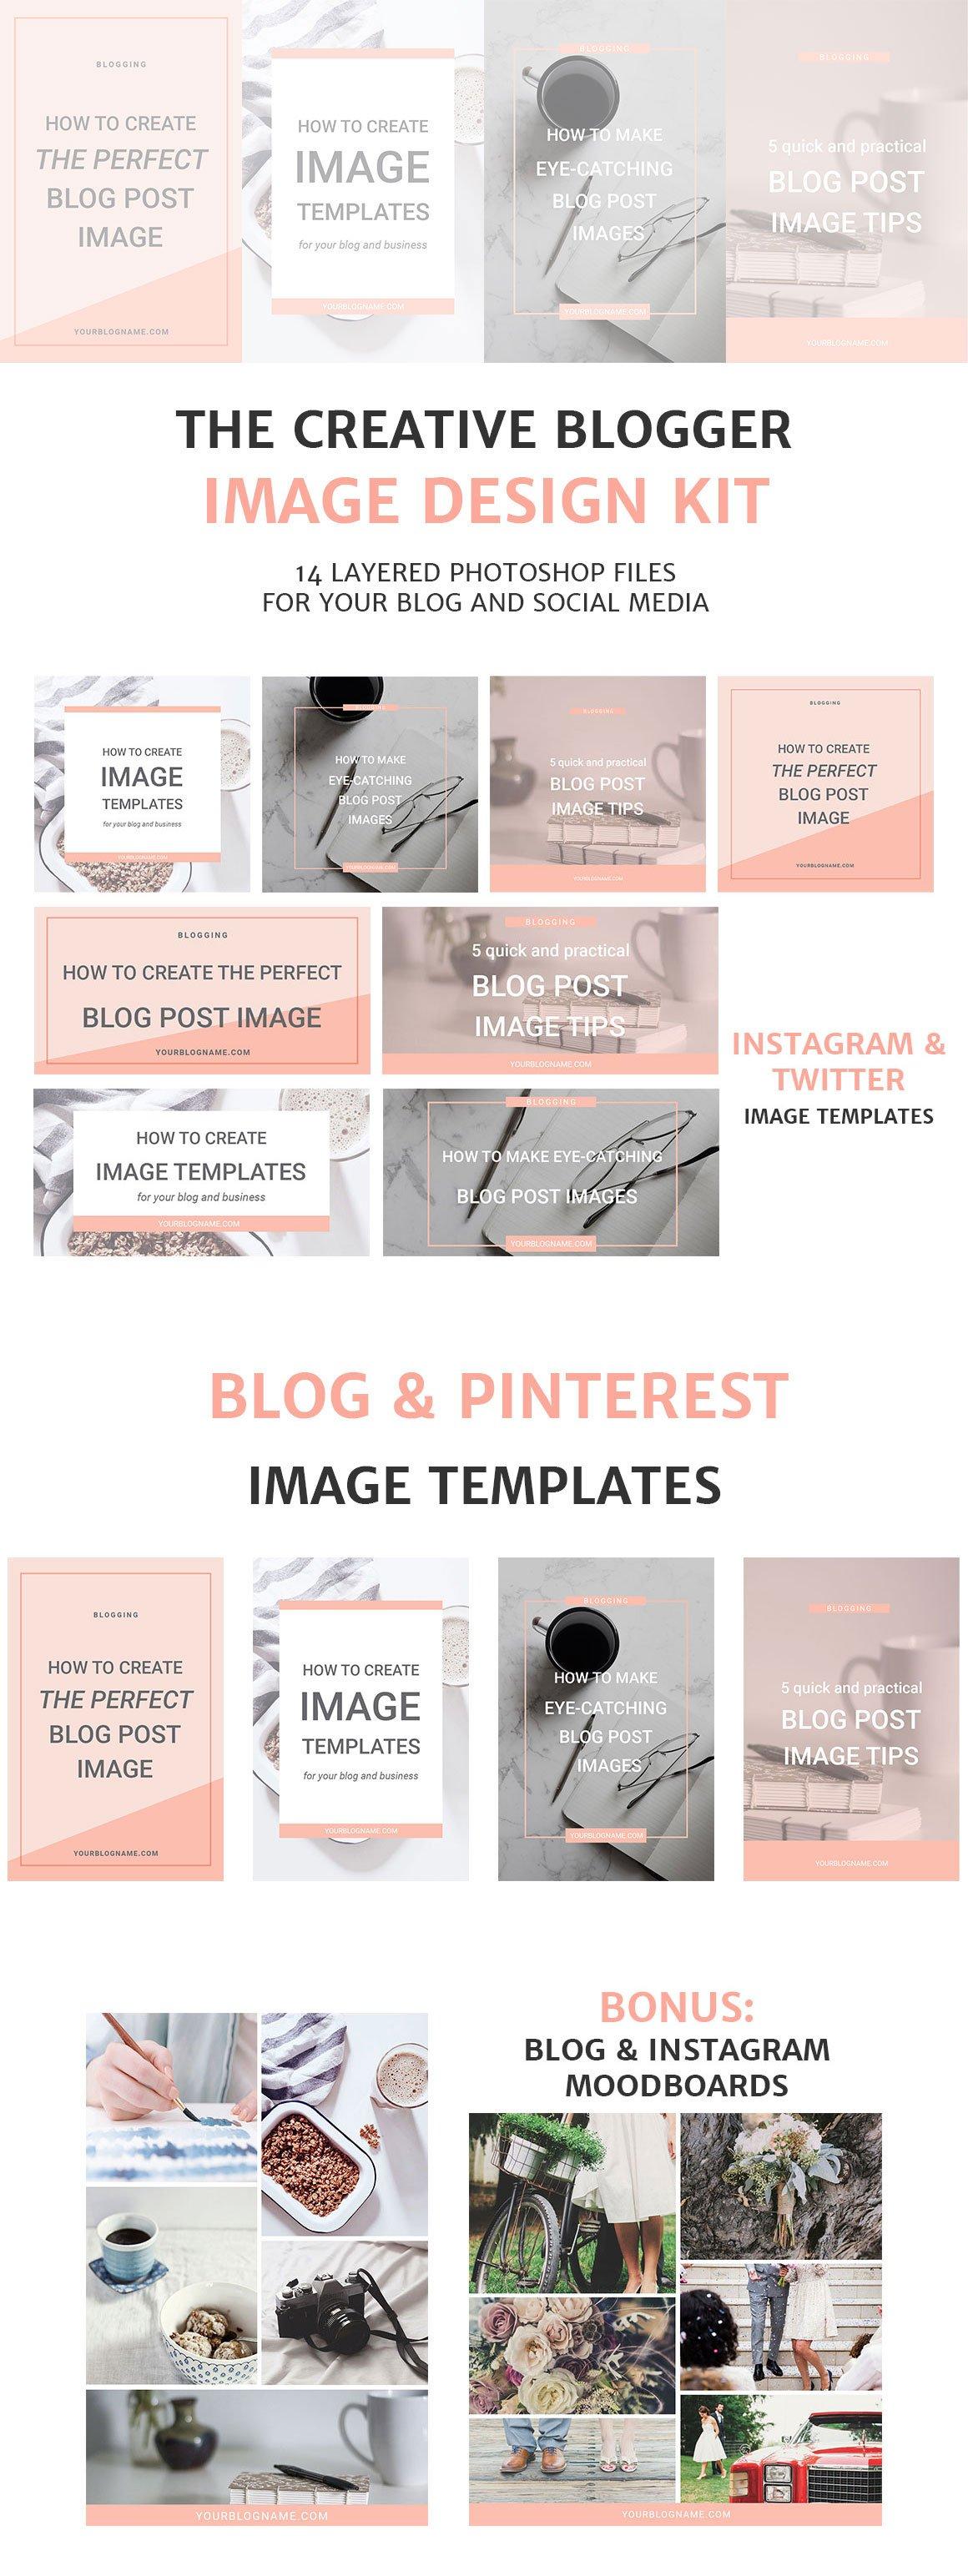 Blog post and social media image templates